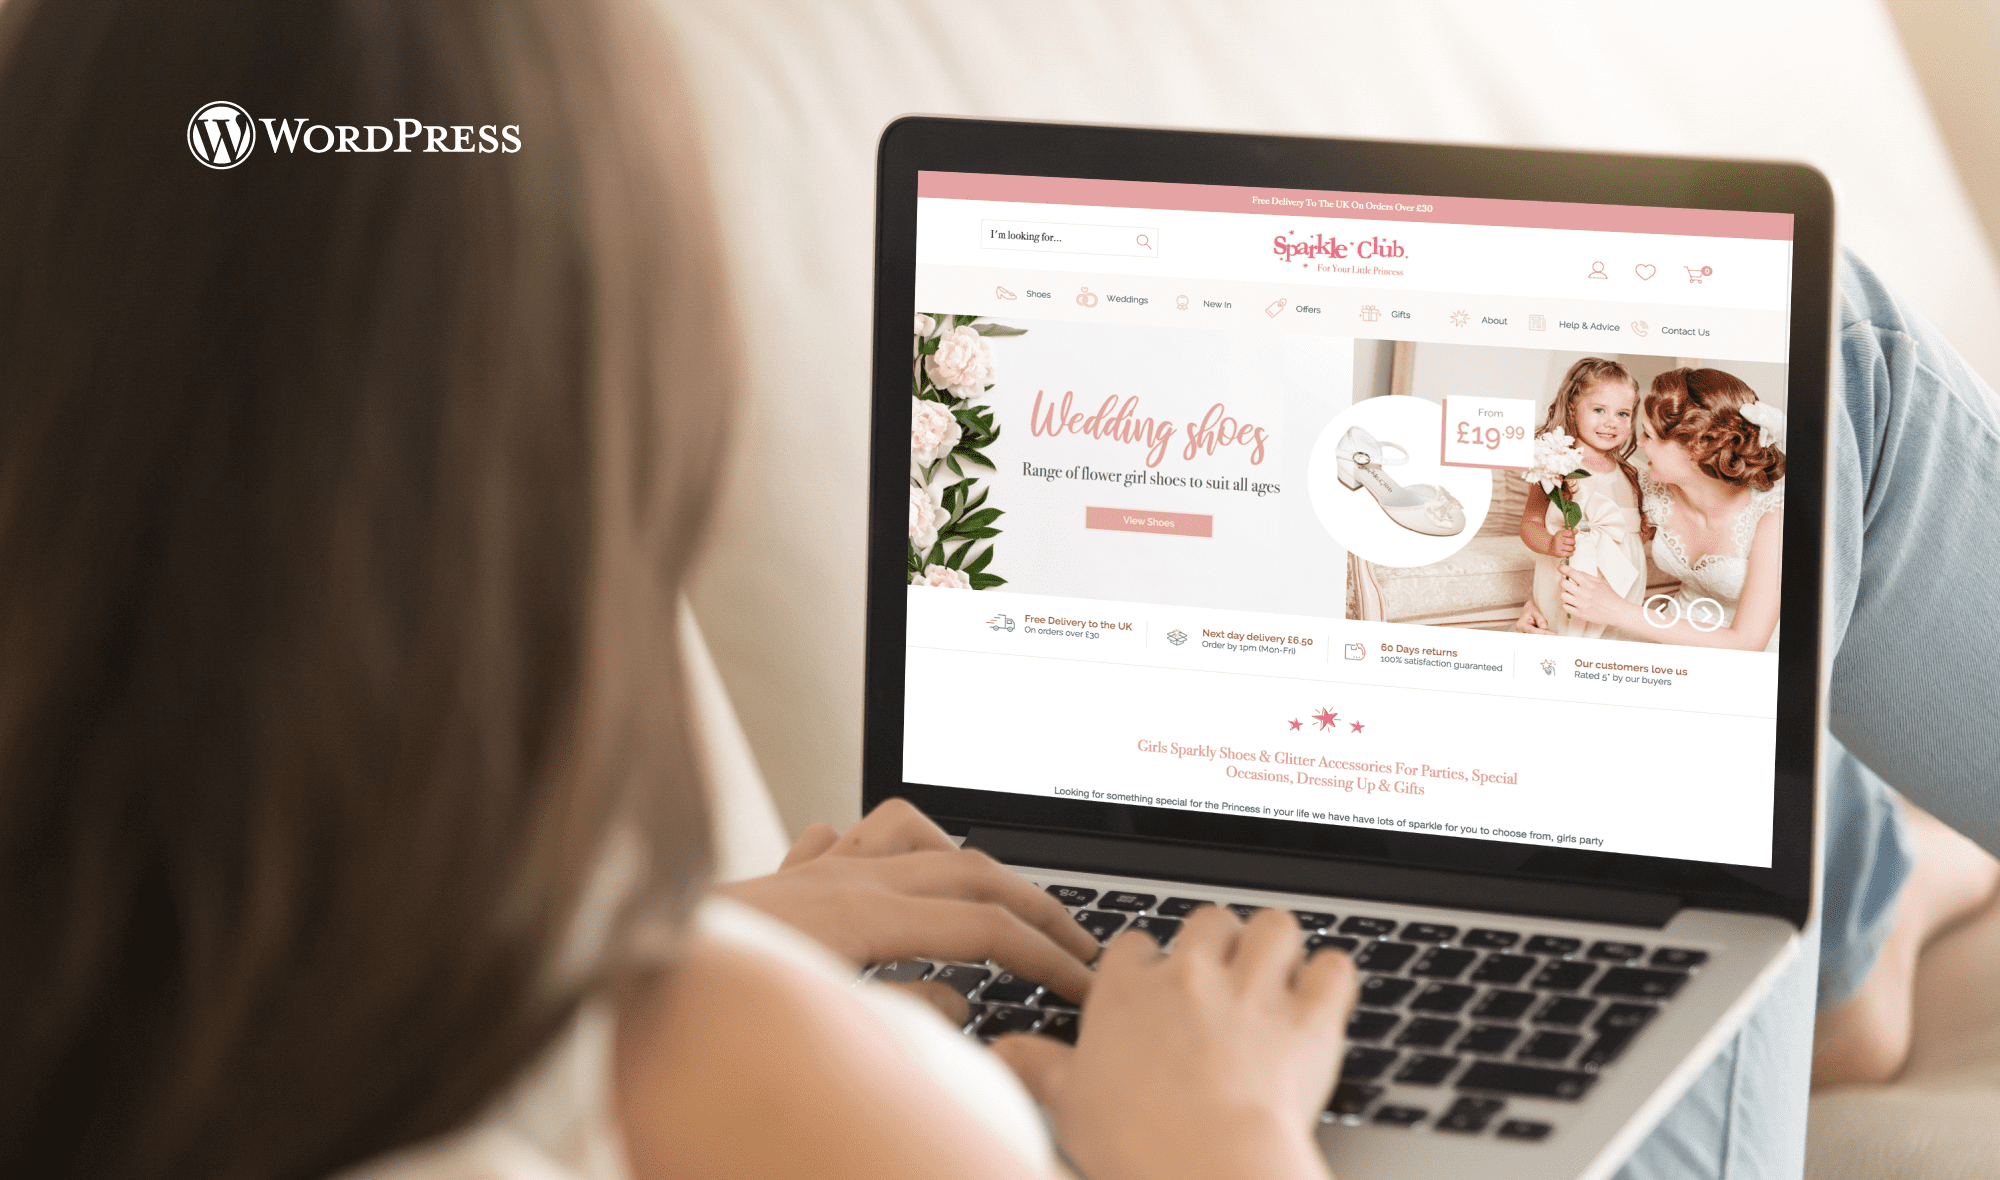 The Sparkle Club - Wordpress Website